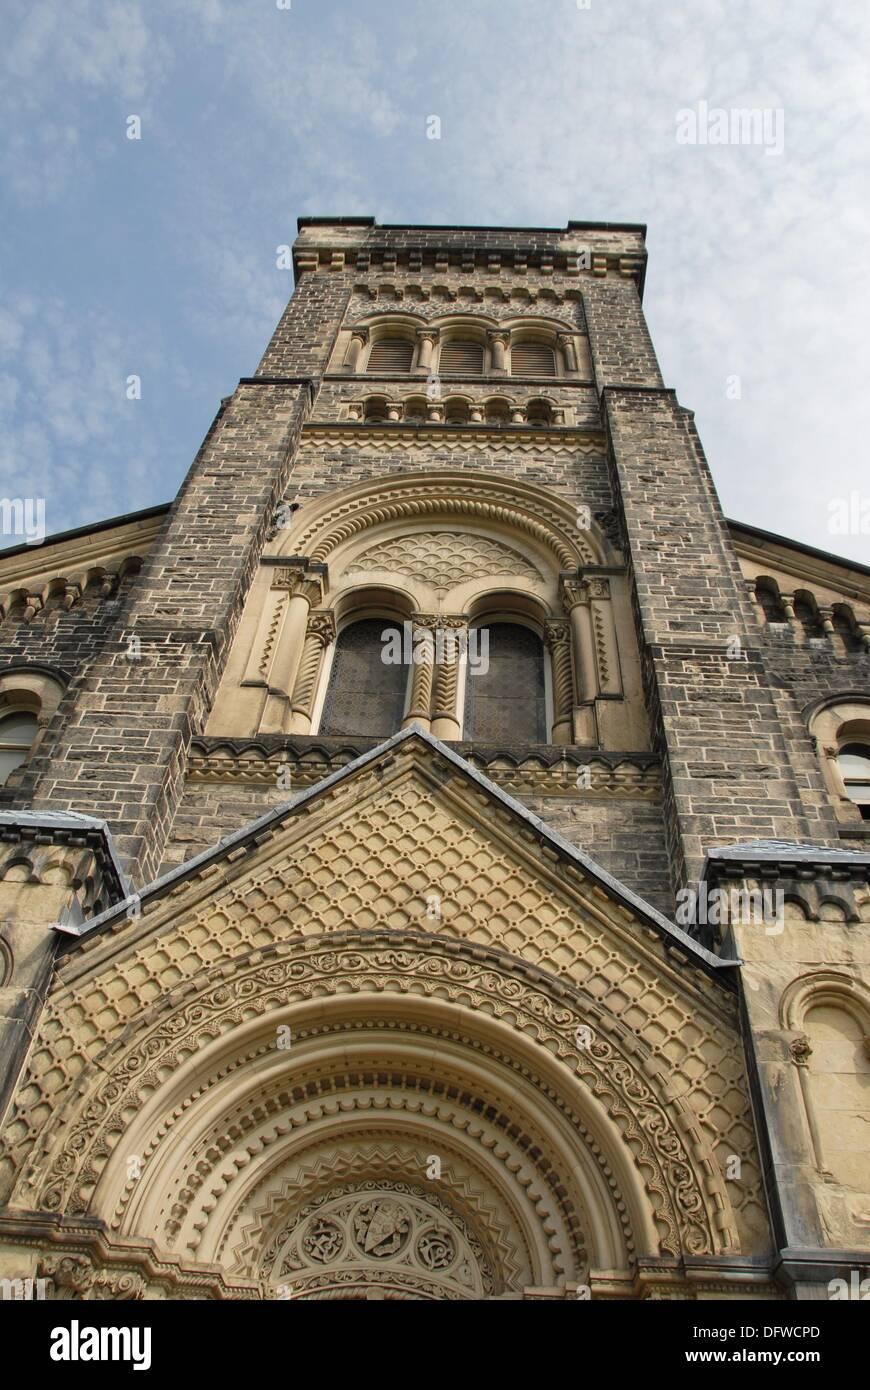 Tower of  the University College at the University of Toronto. Toronto, Ontario, Canada. - Stock Image